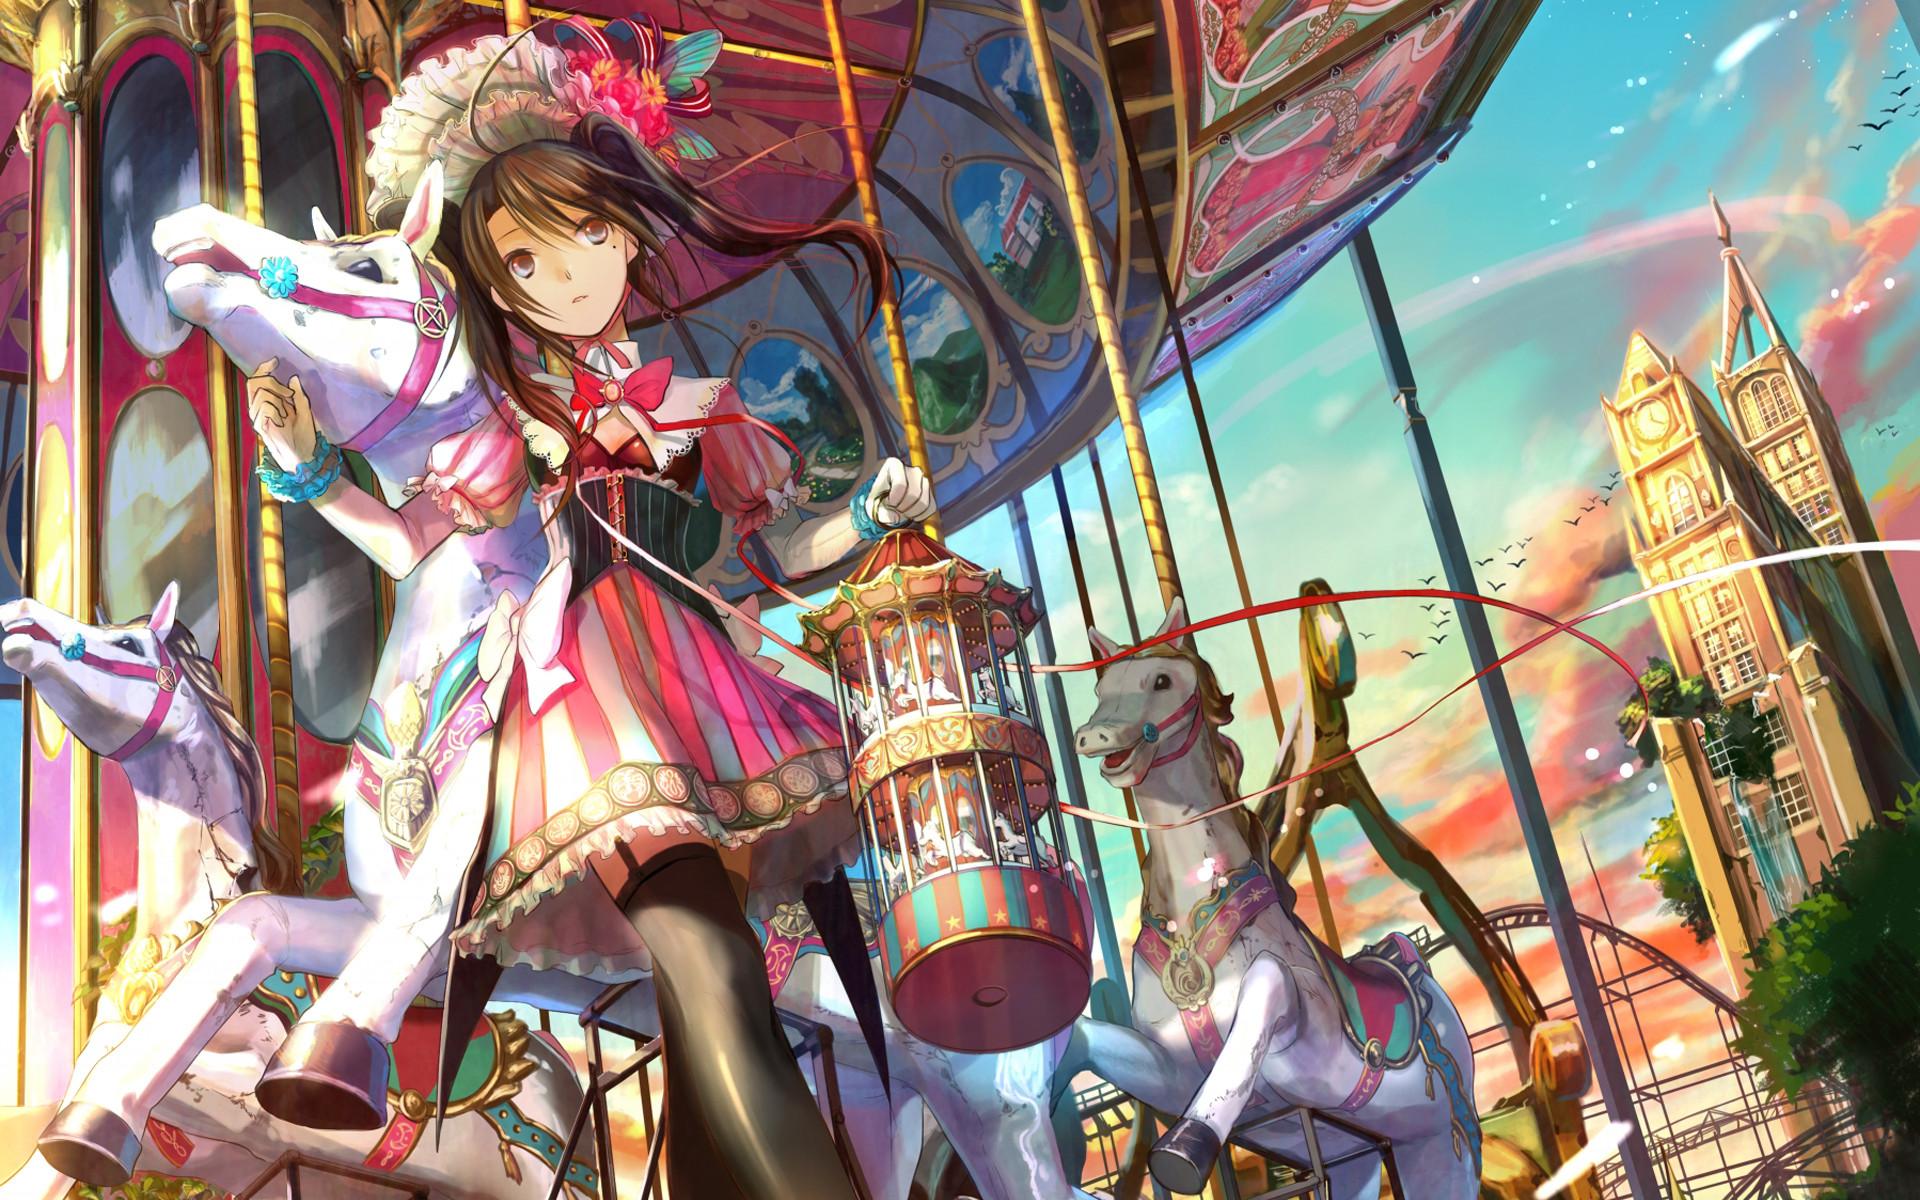 wallpaper, manga, japanese, background, jspot, gallery, anime, sekai .